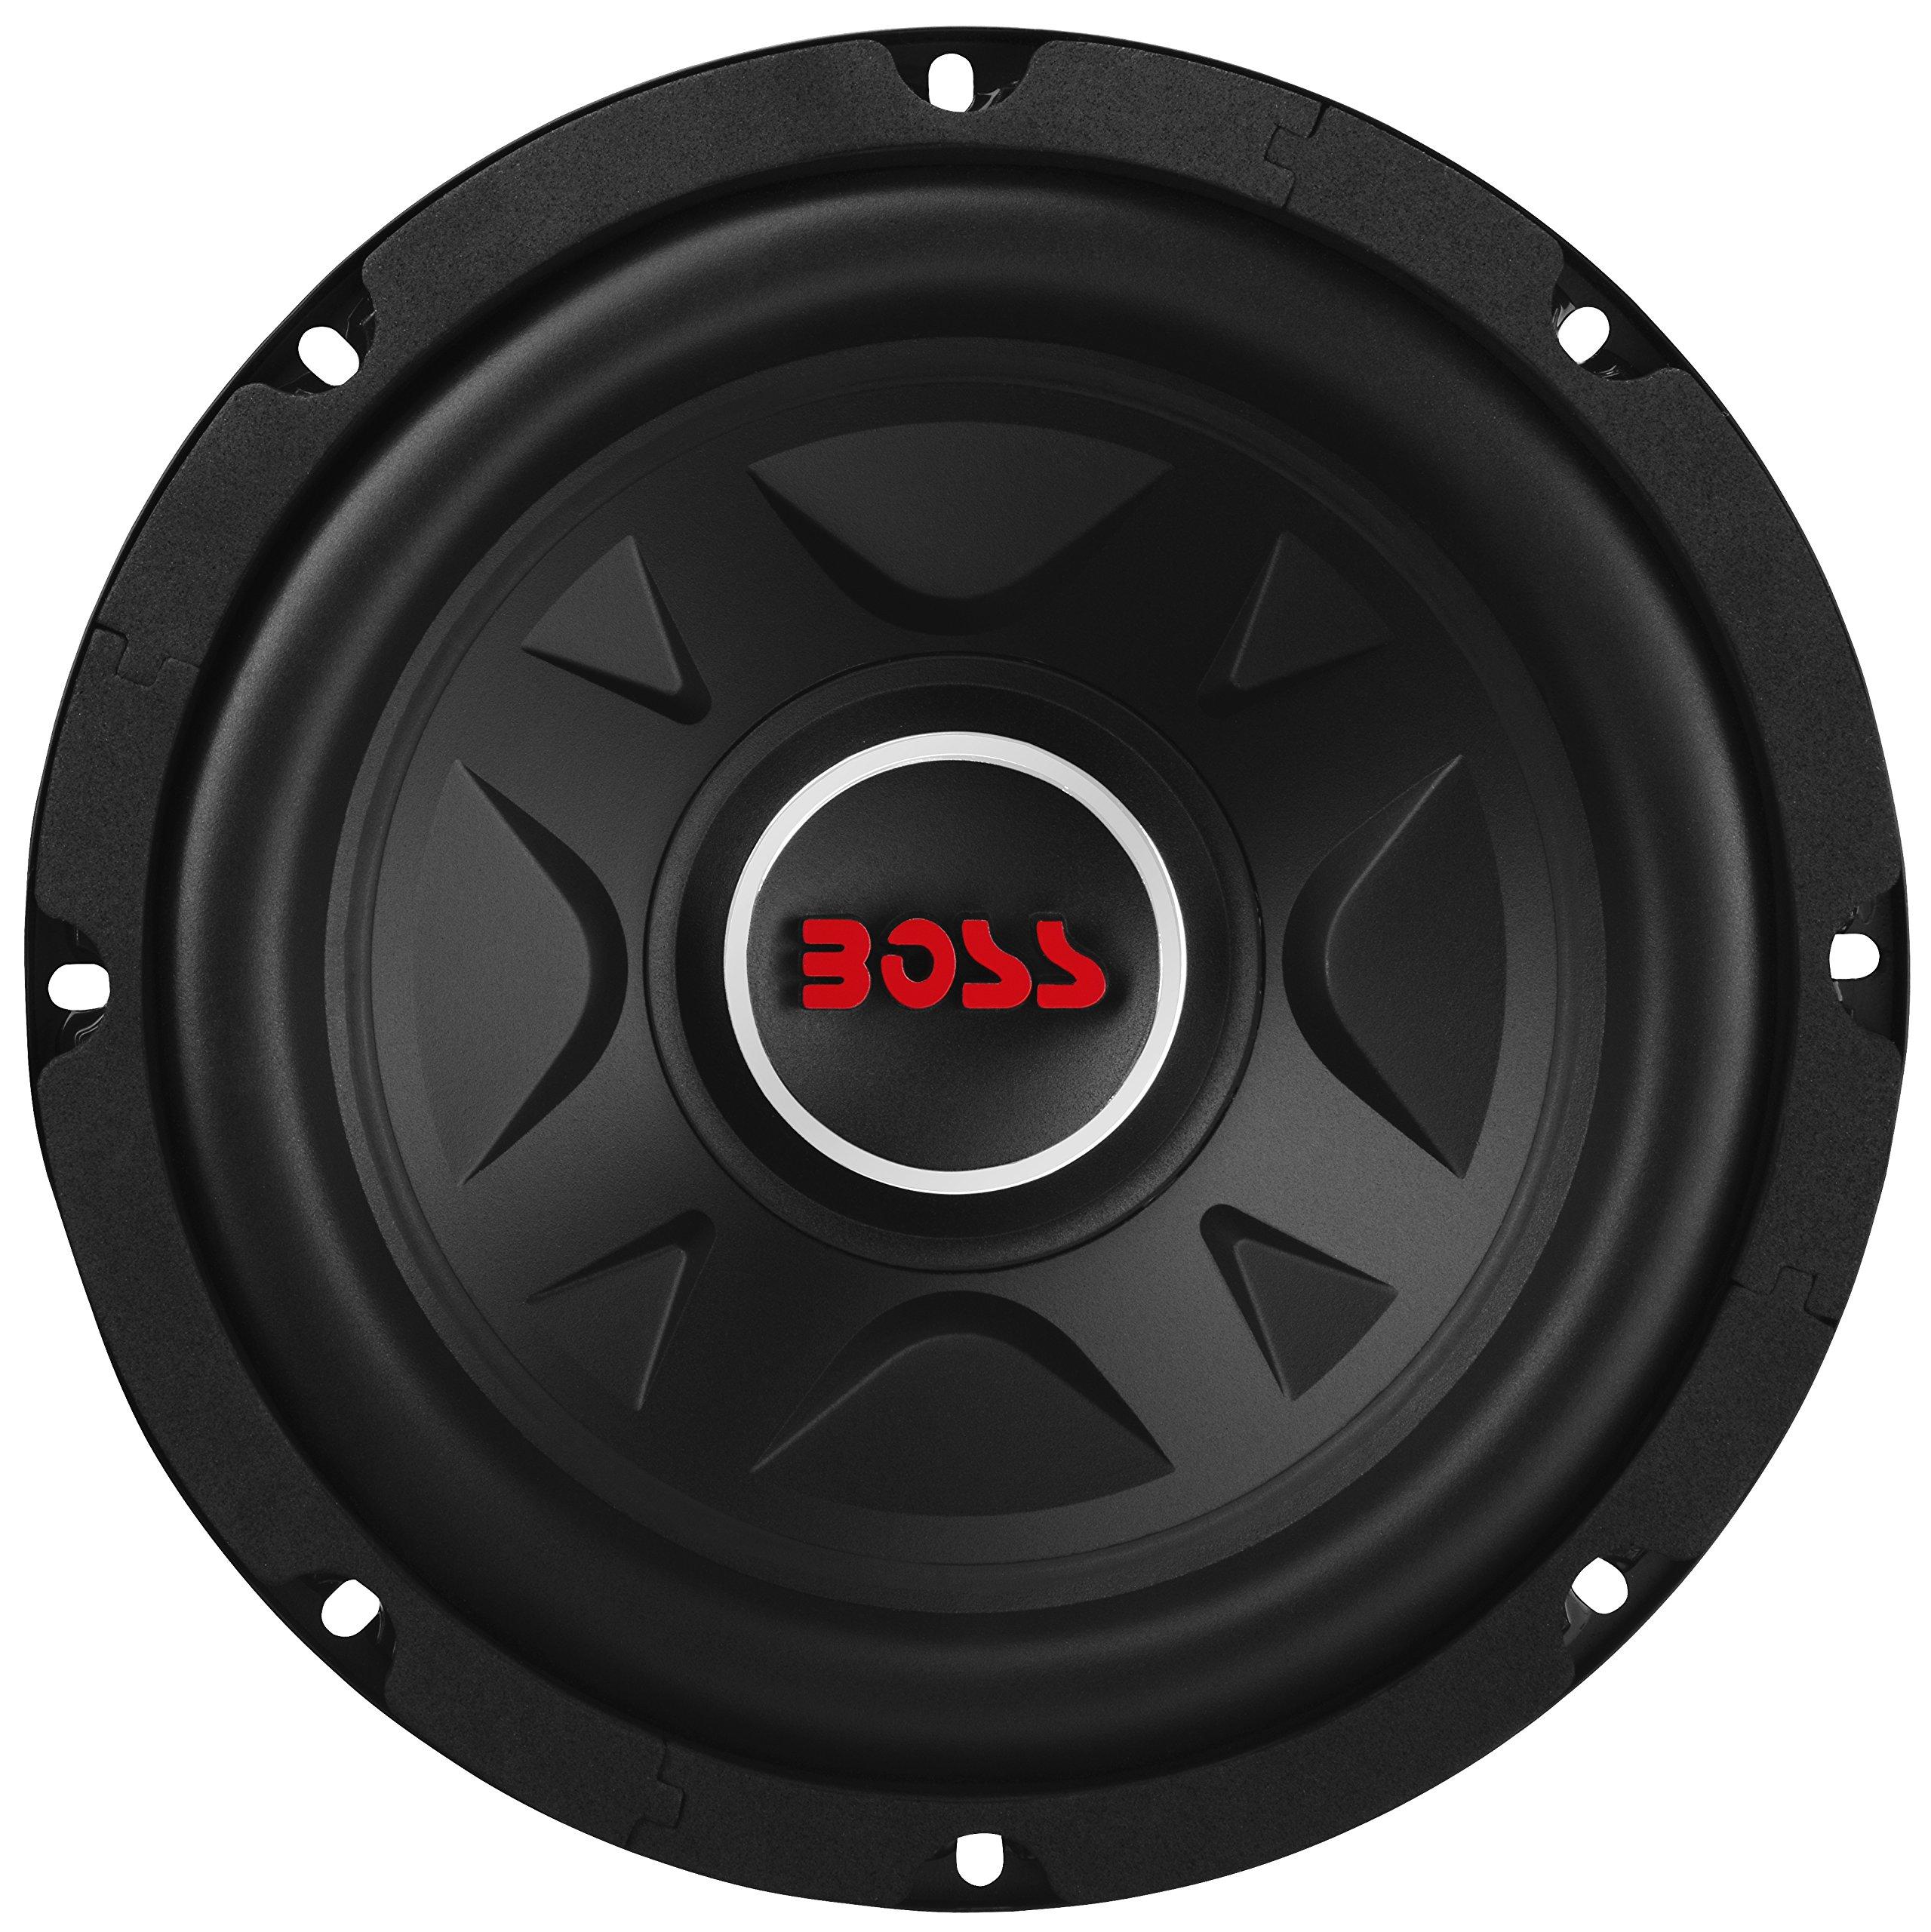 BOSS Audio Elite BE8D 8'' Dual Voice Coil Subwoofer, 600 Watts Max